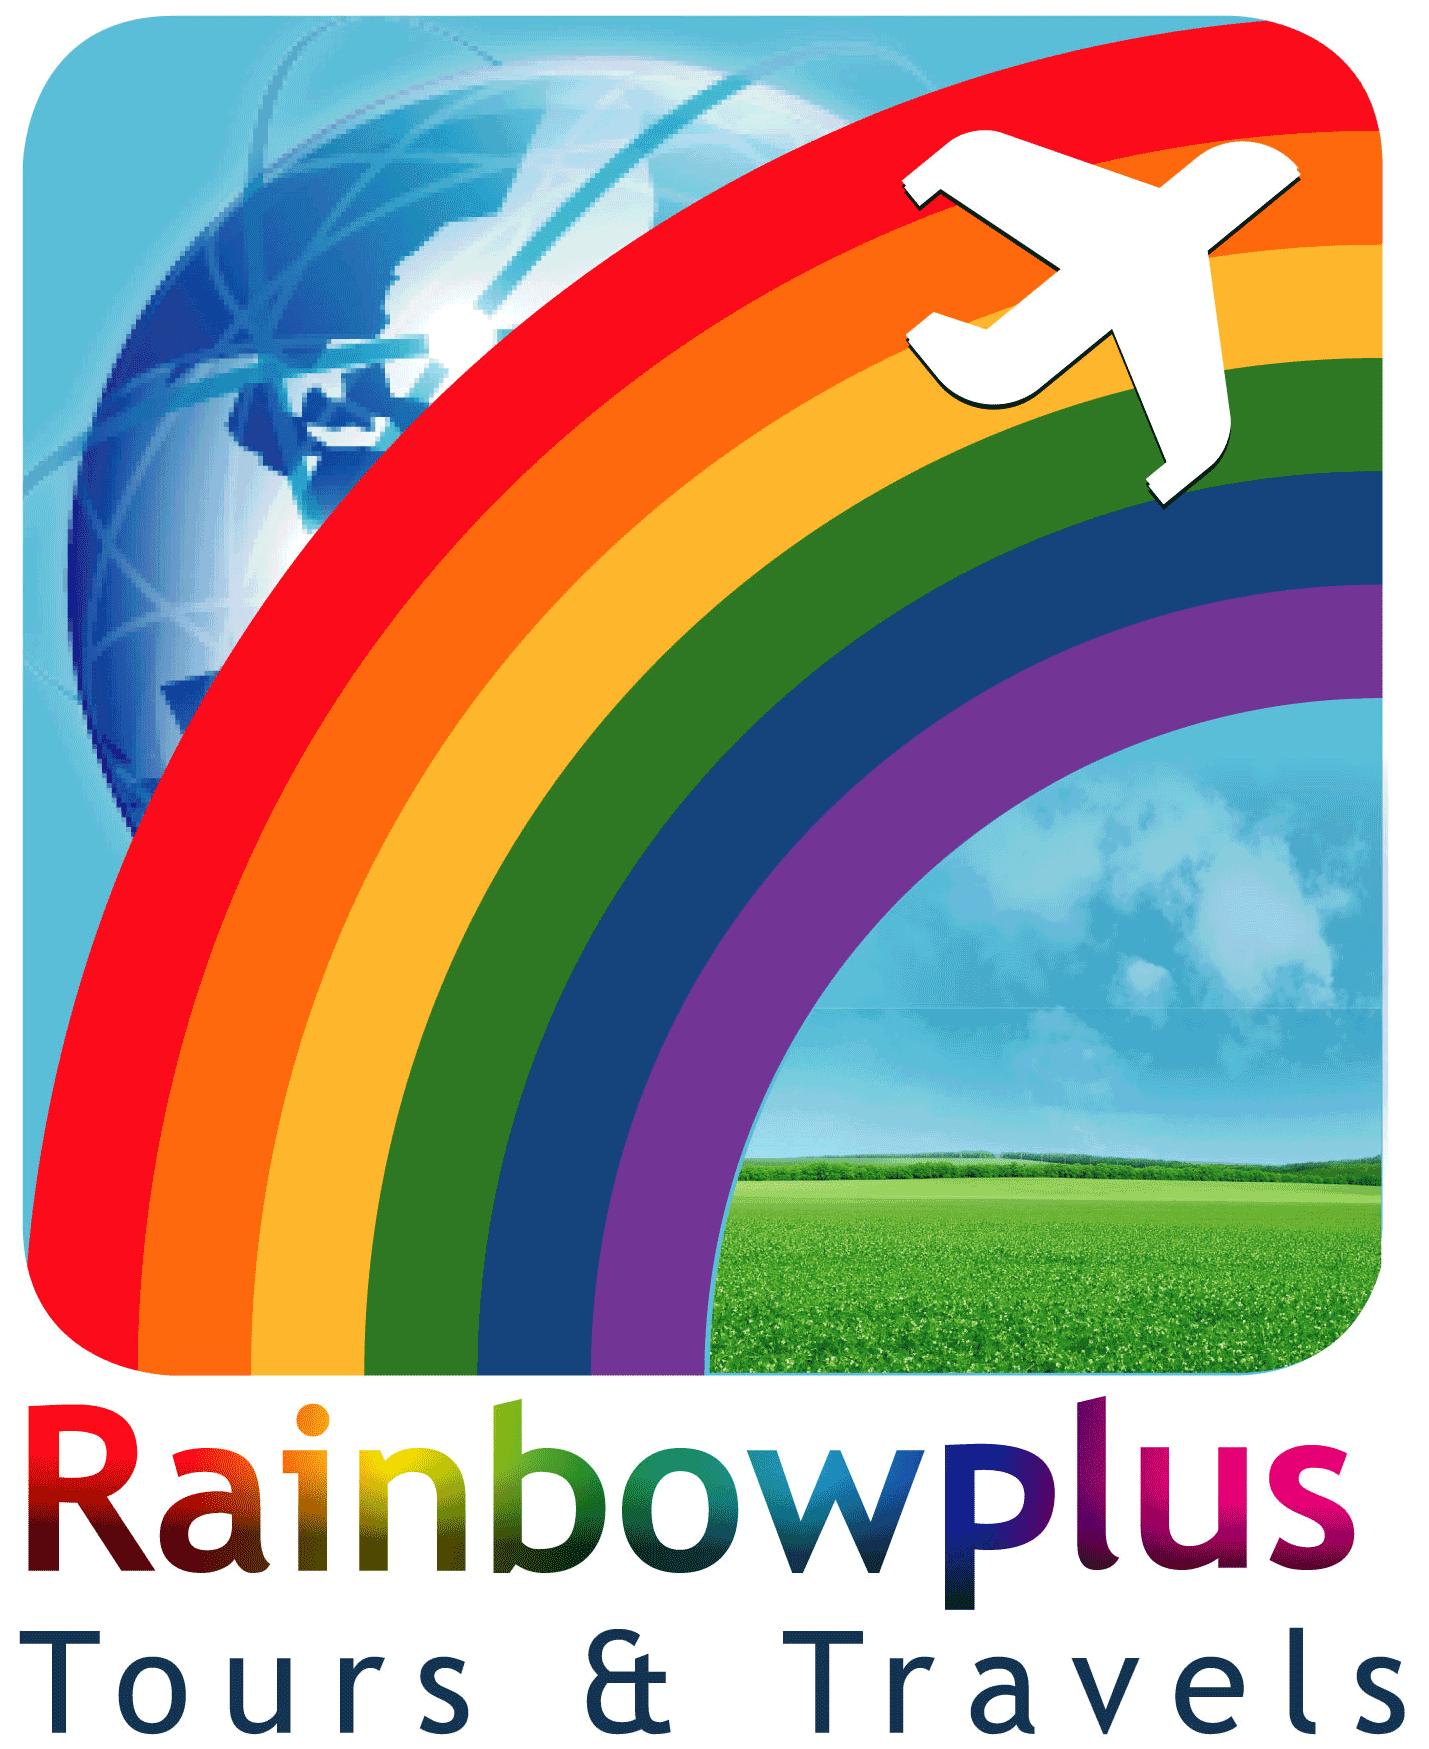 http://rainbowplusbd.com/images/logo.png